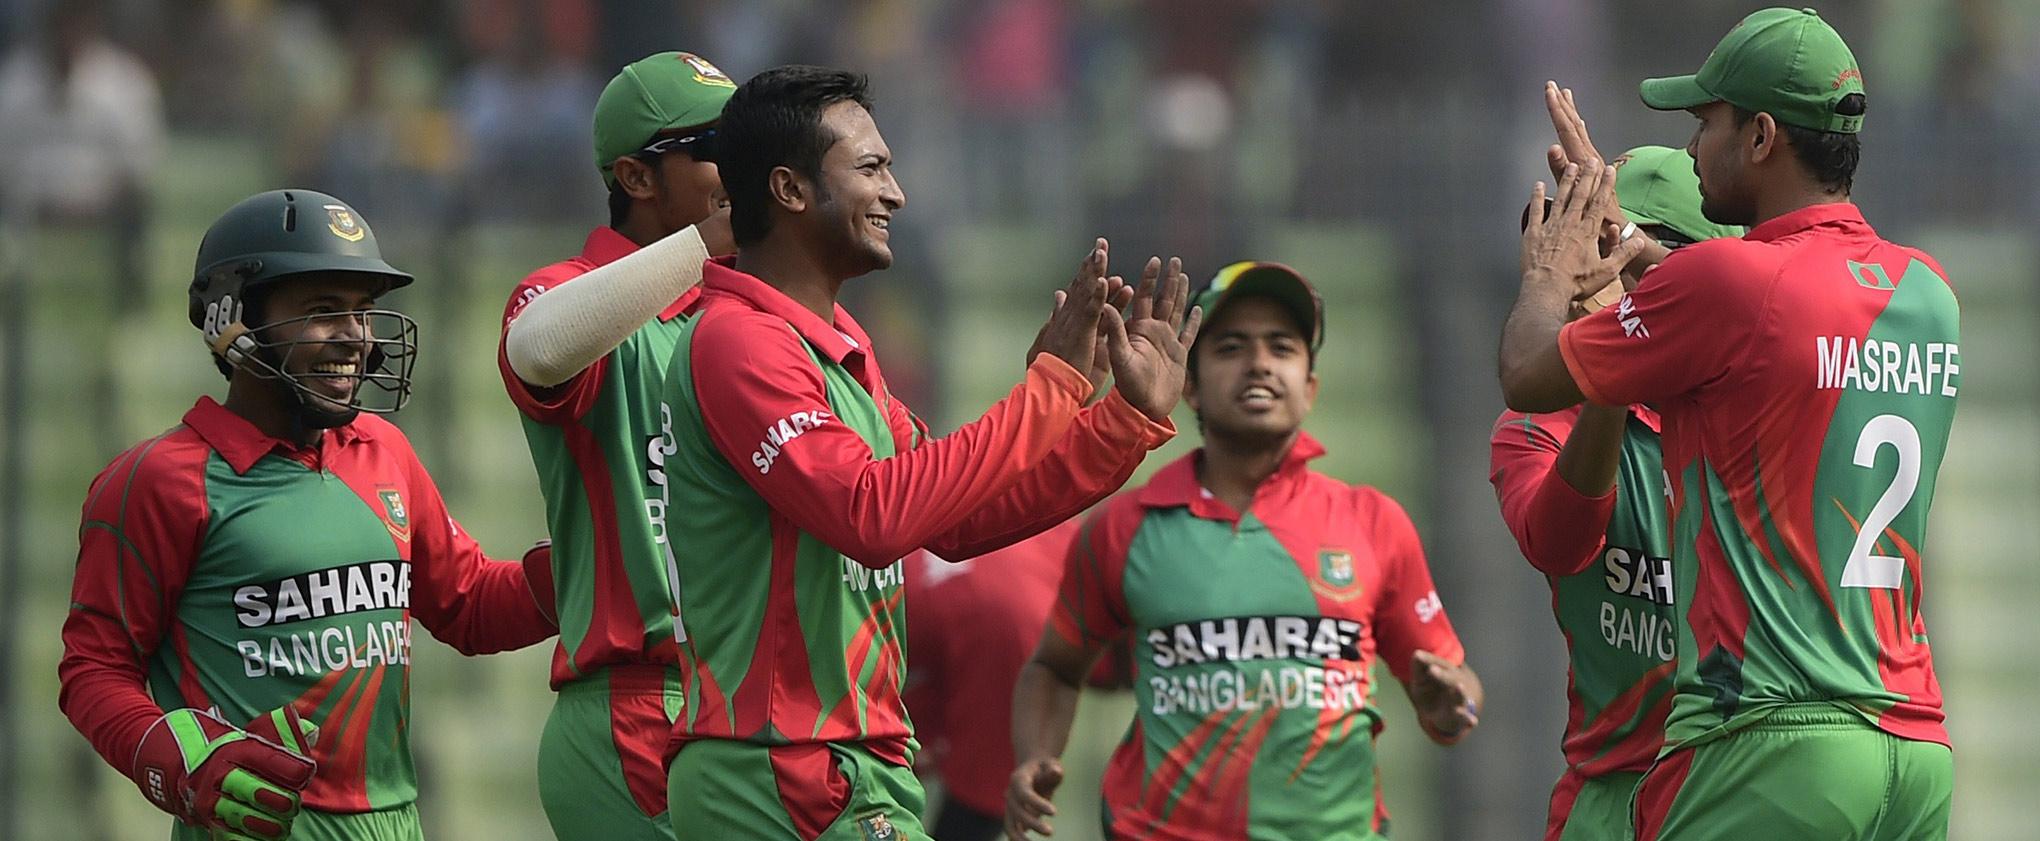 Bangladesh Cricket Team Worldcup 2015.